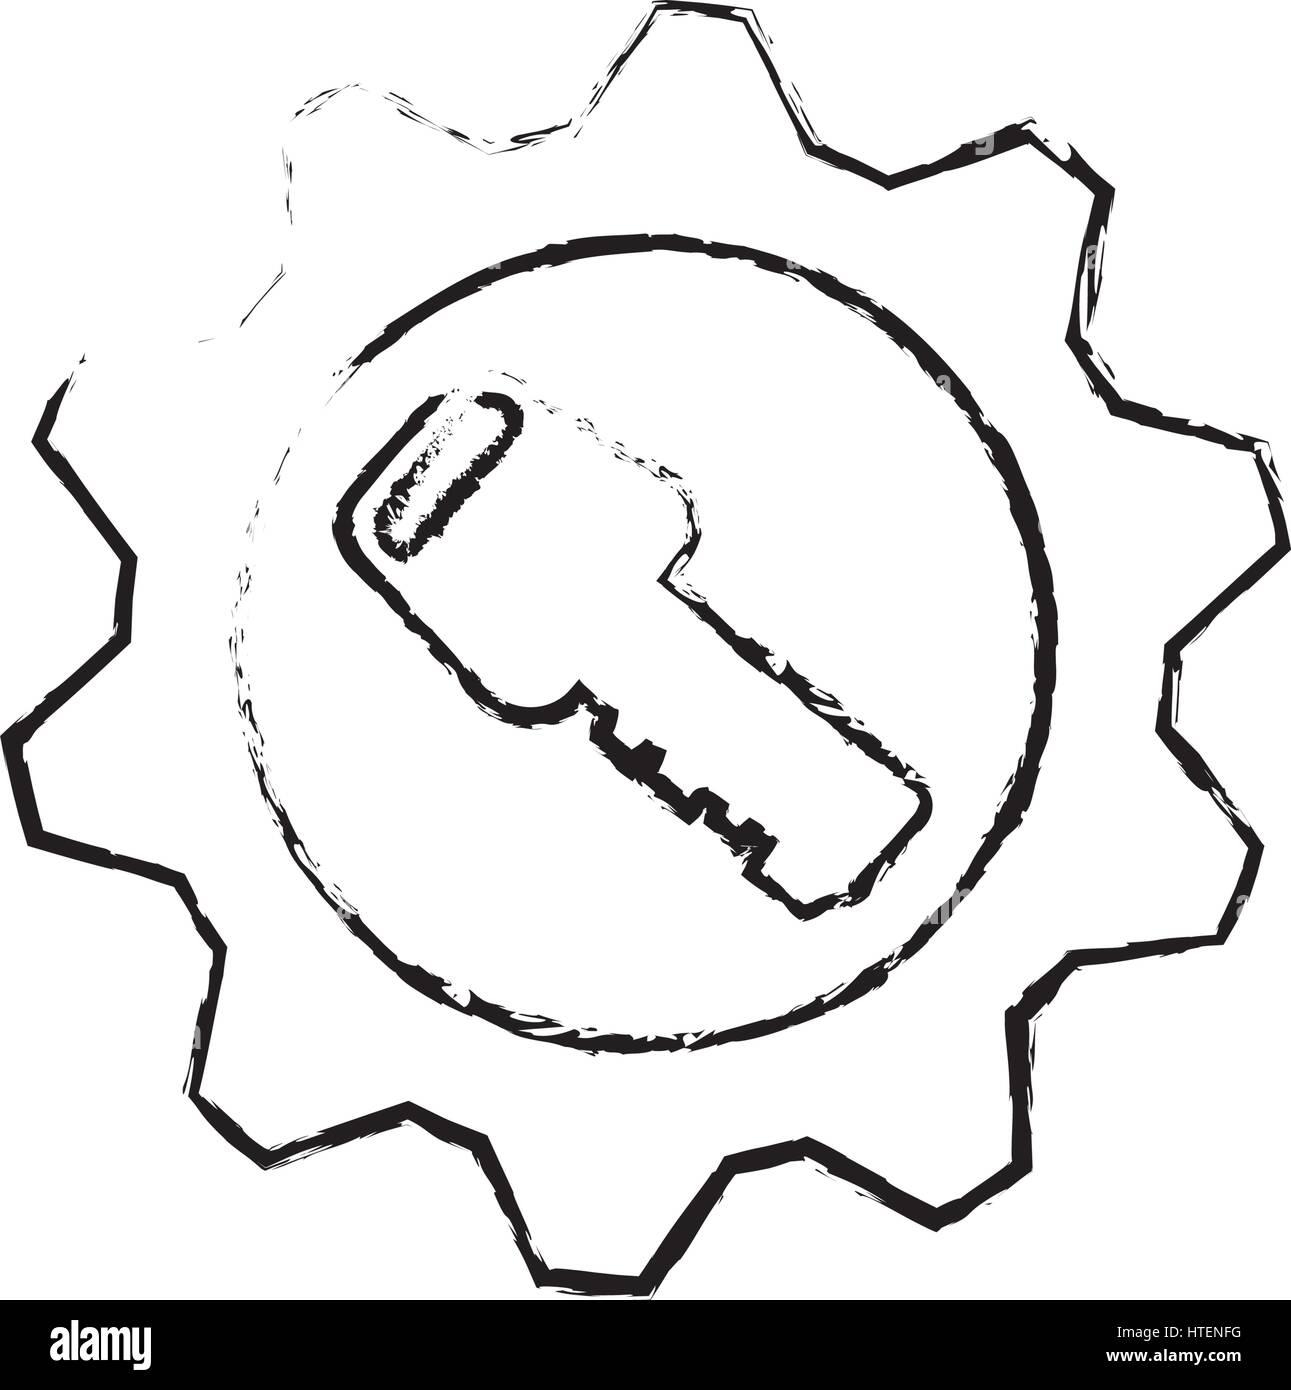 Security key device - Stock Image